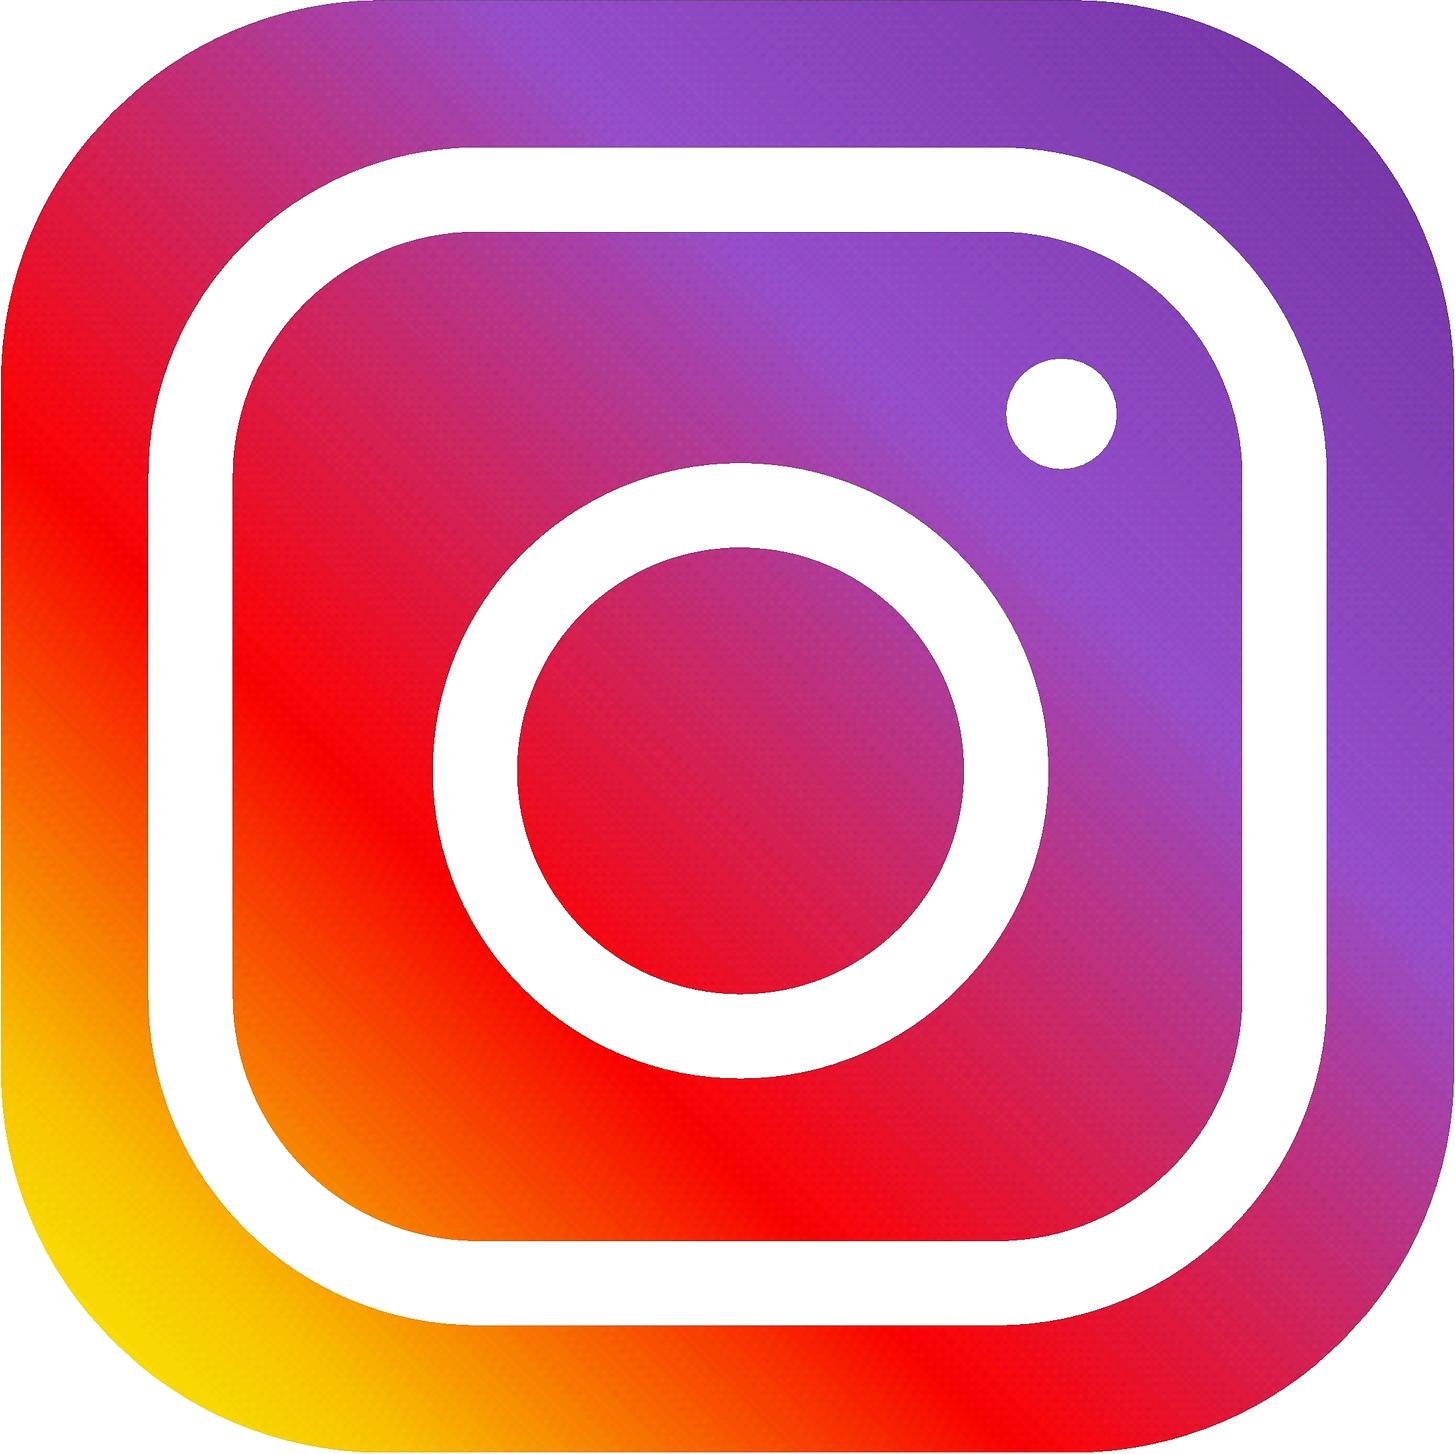 File:Instagram.